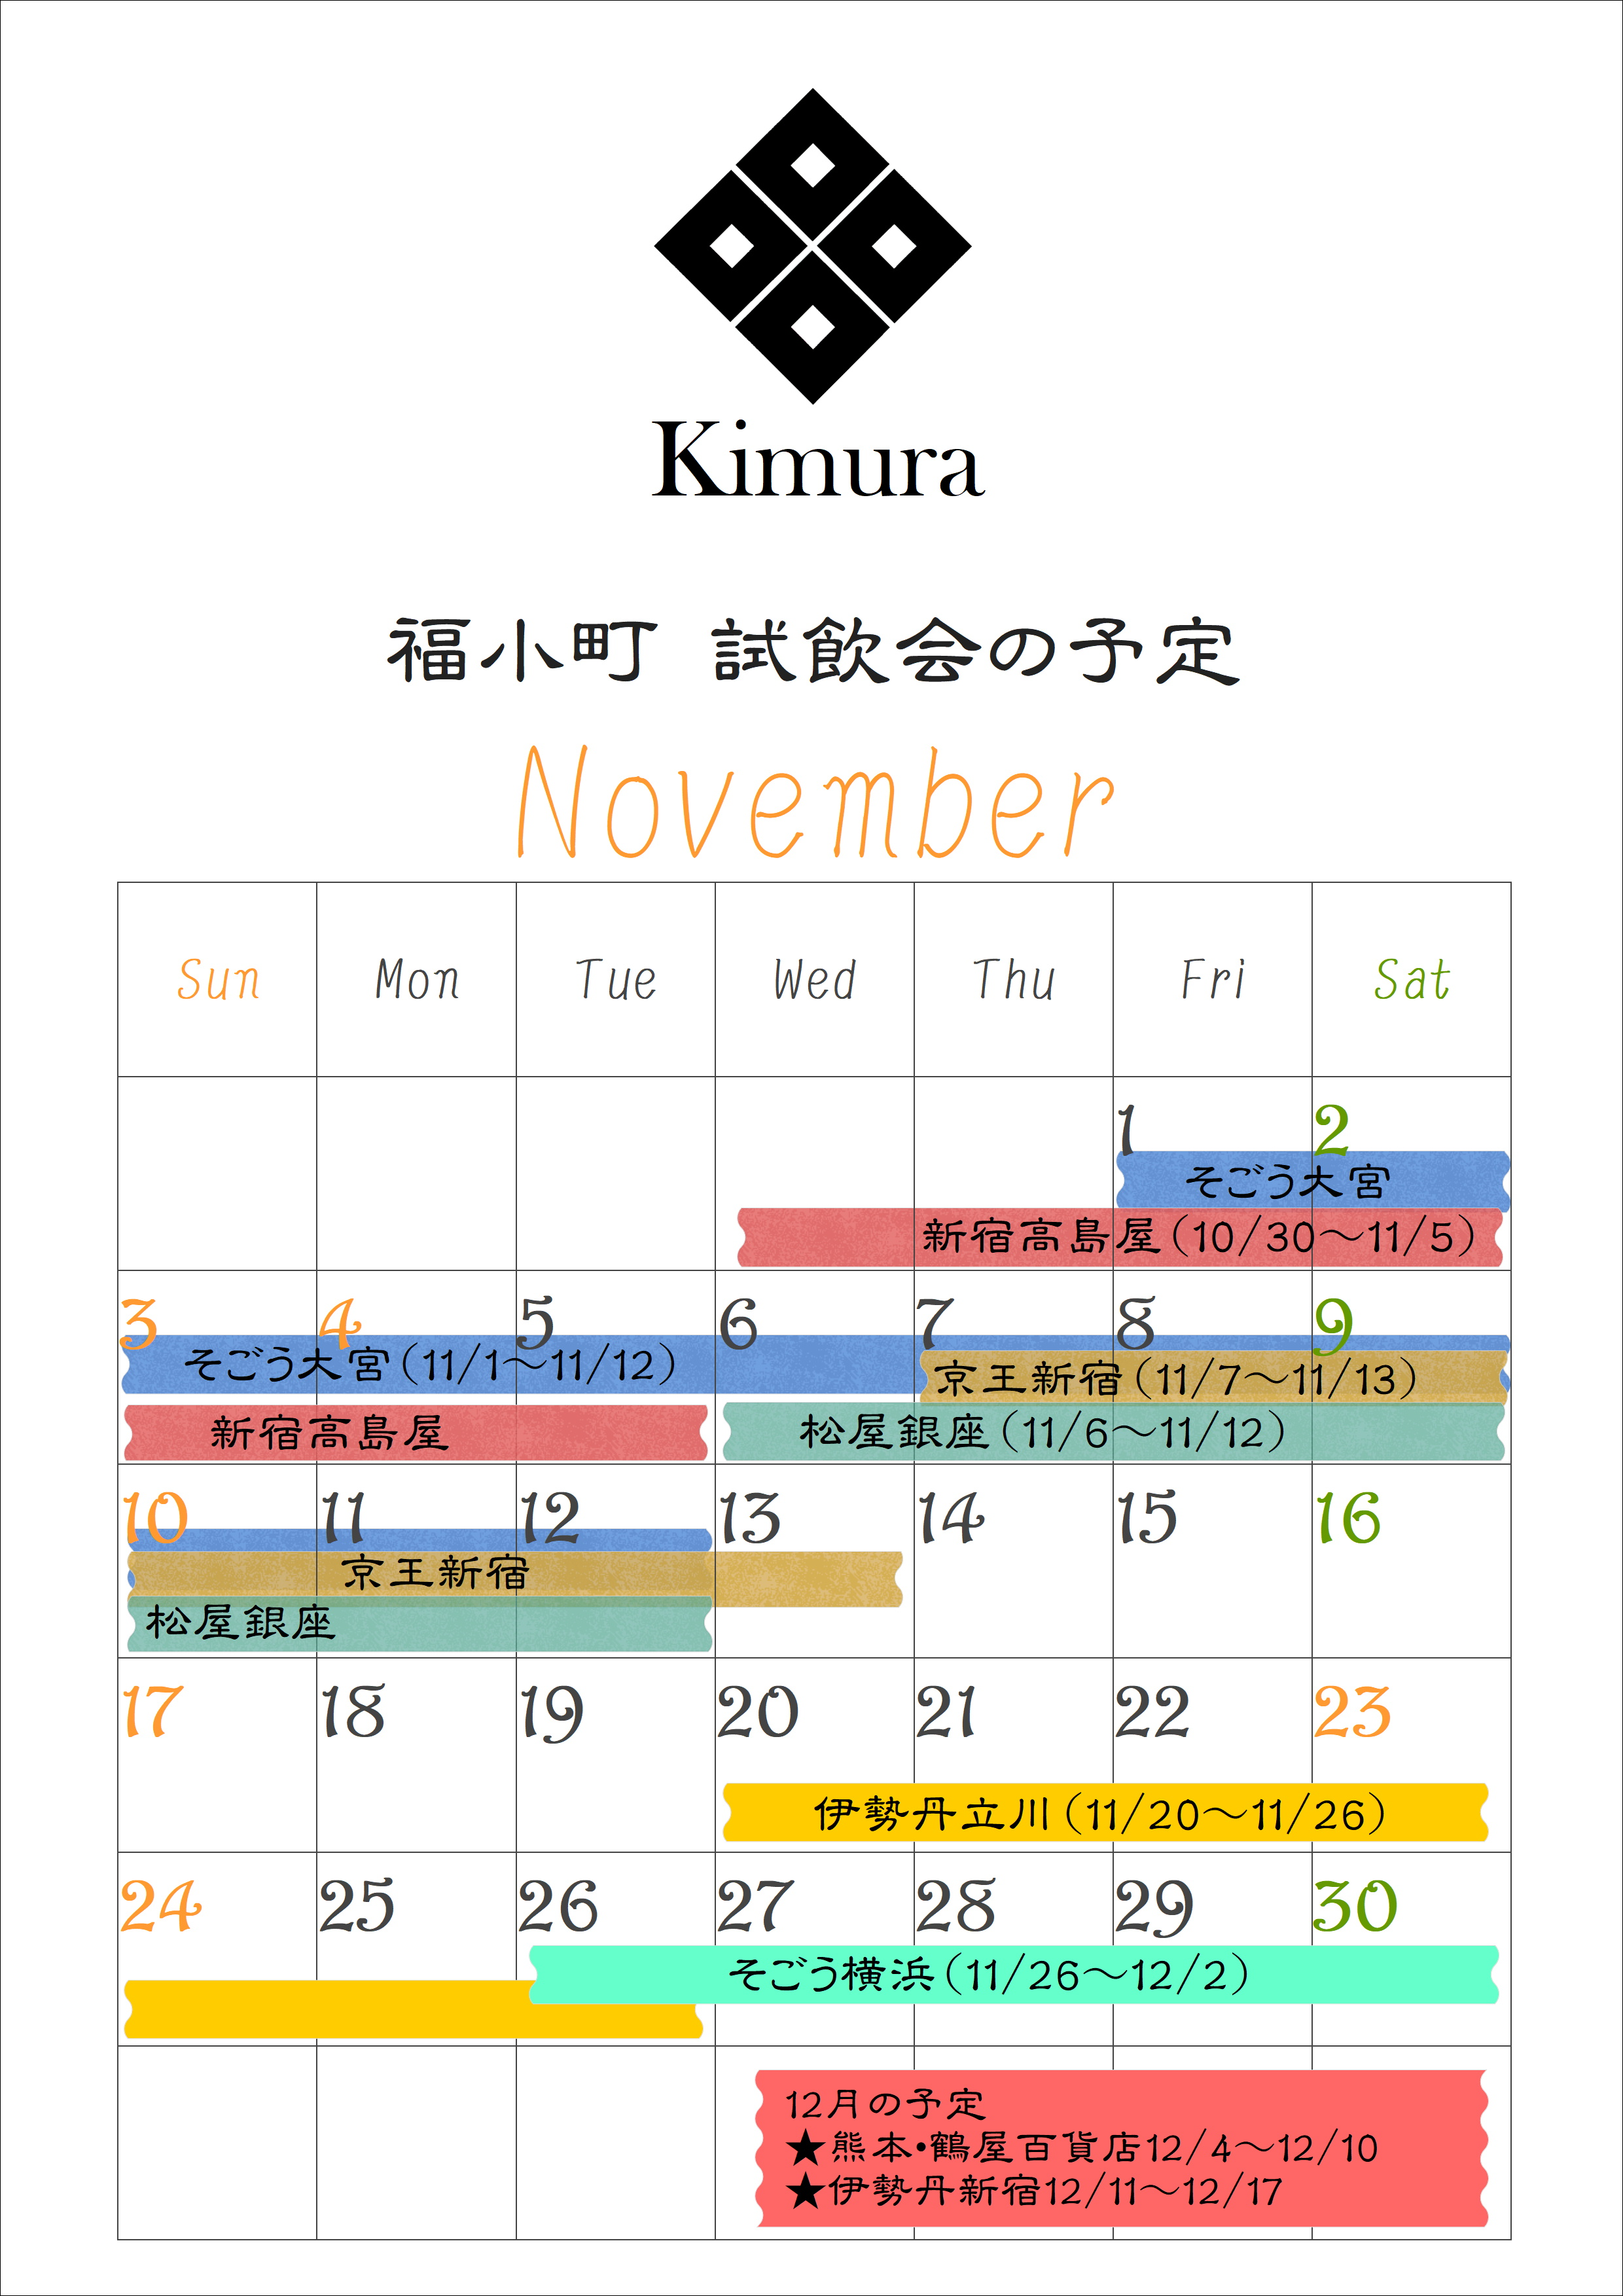 http://www.fukukomachi.com/blog/photo/20191115.JPG